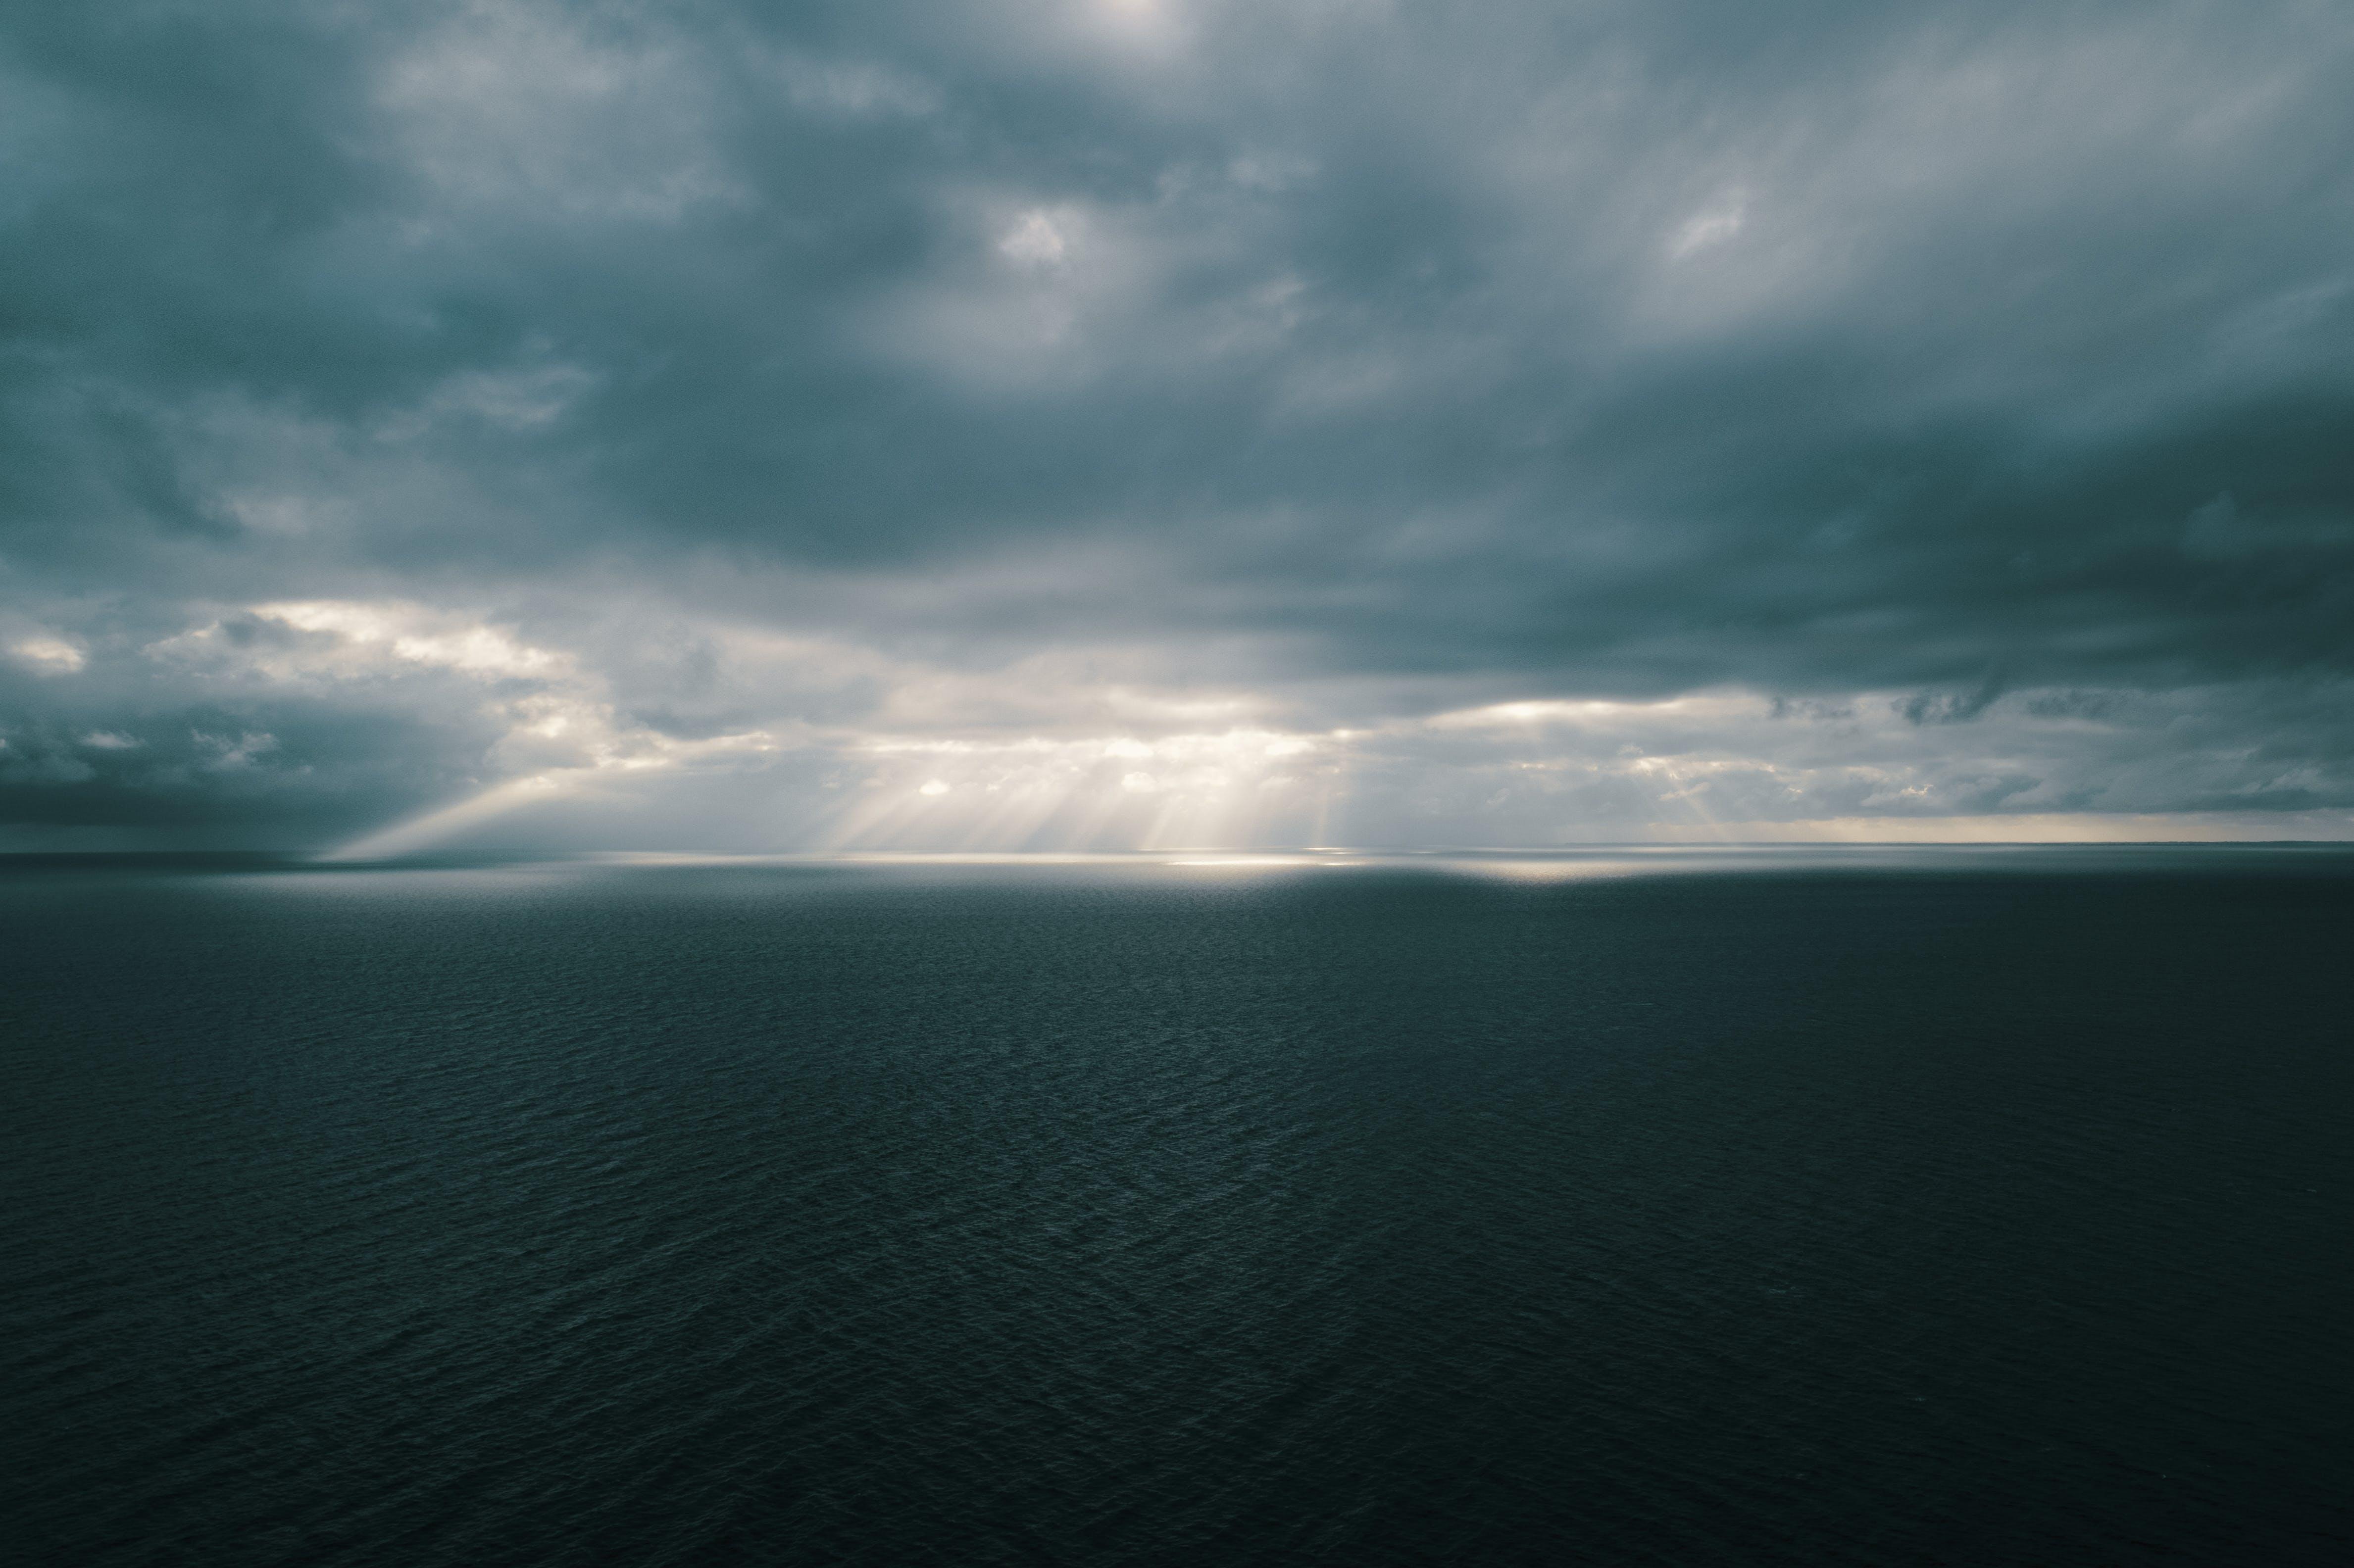 Photograph of the Open Ocean